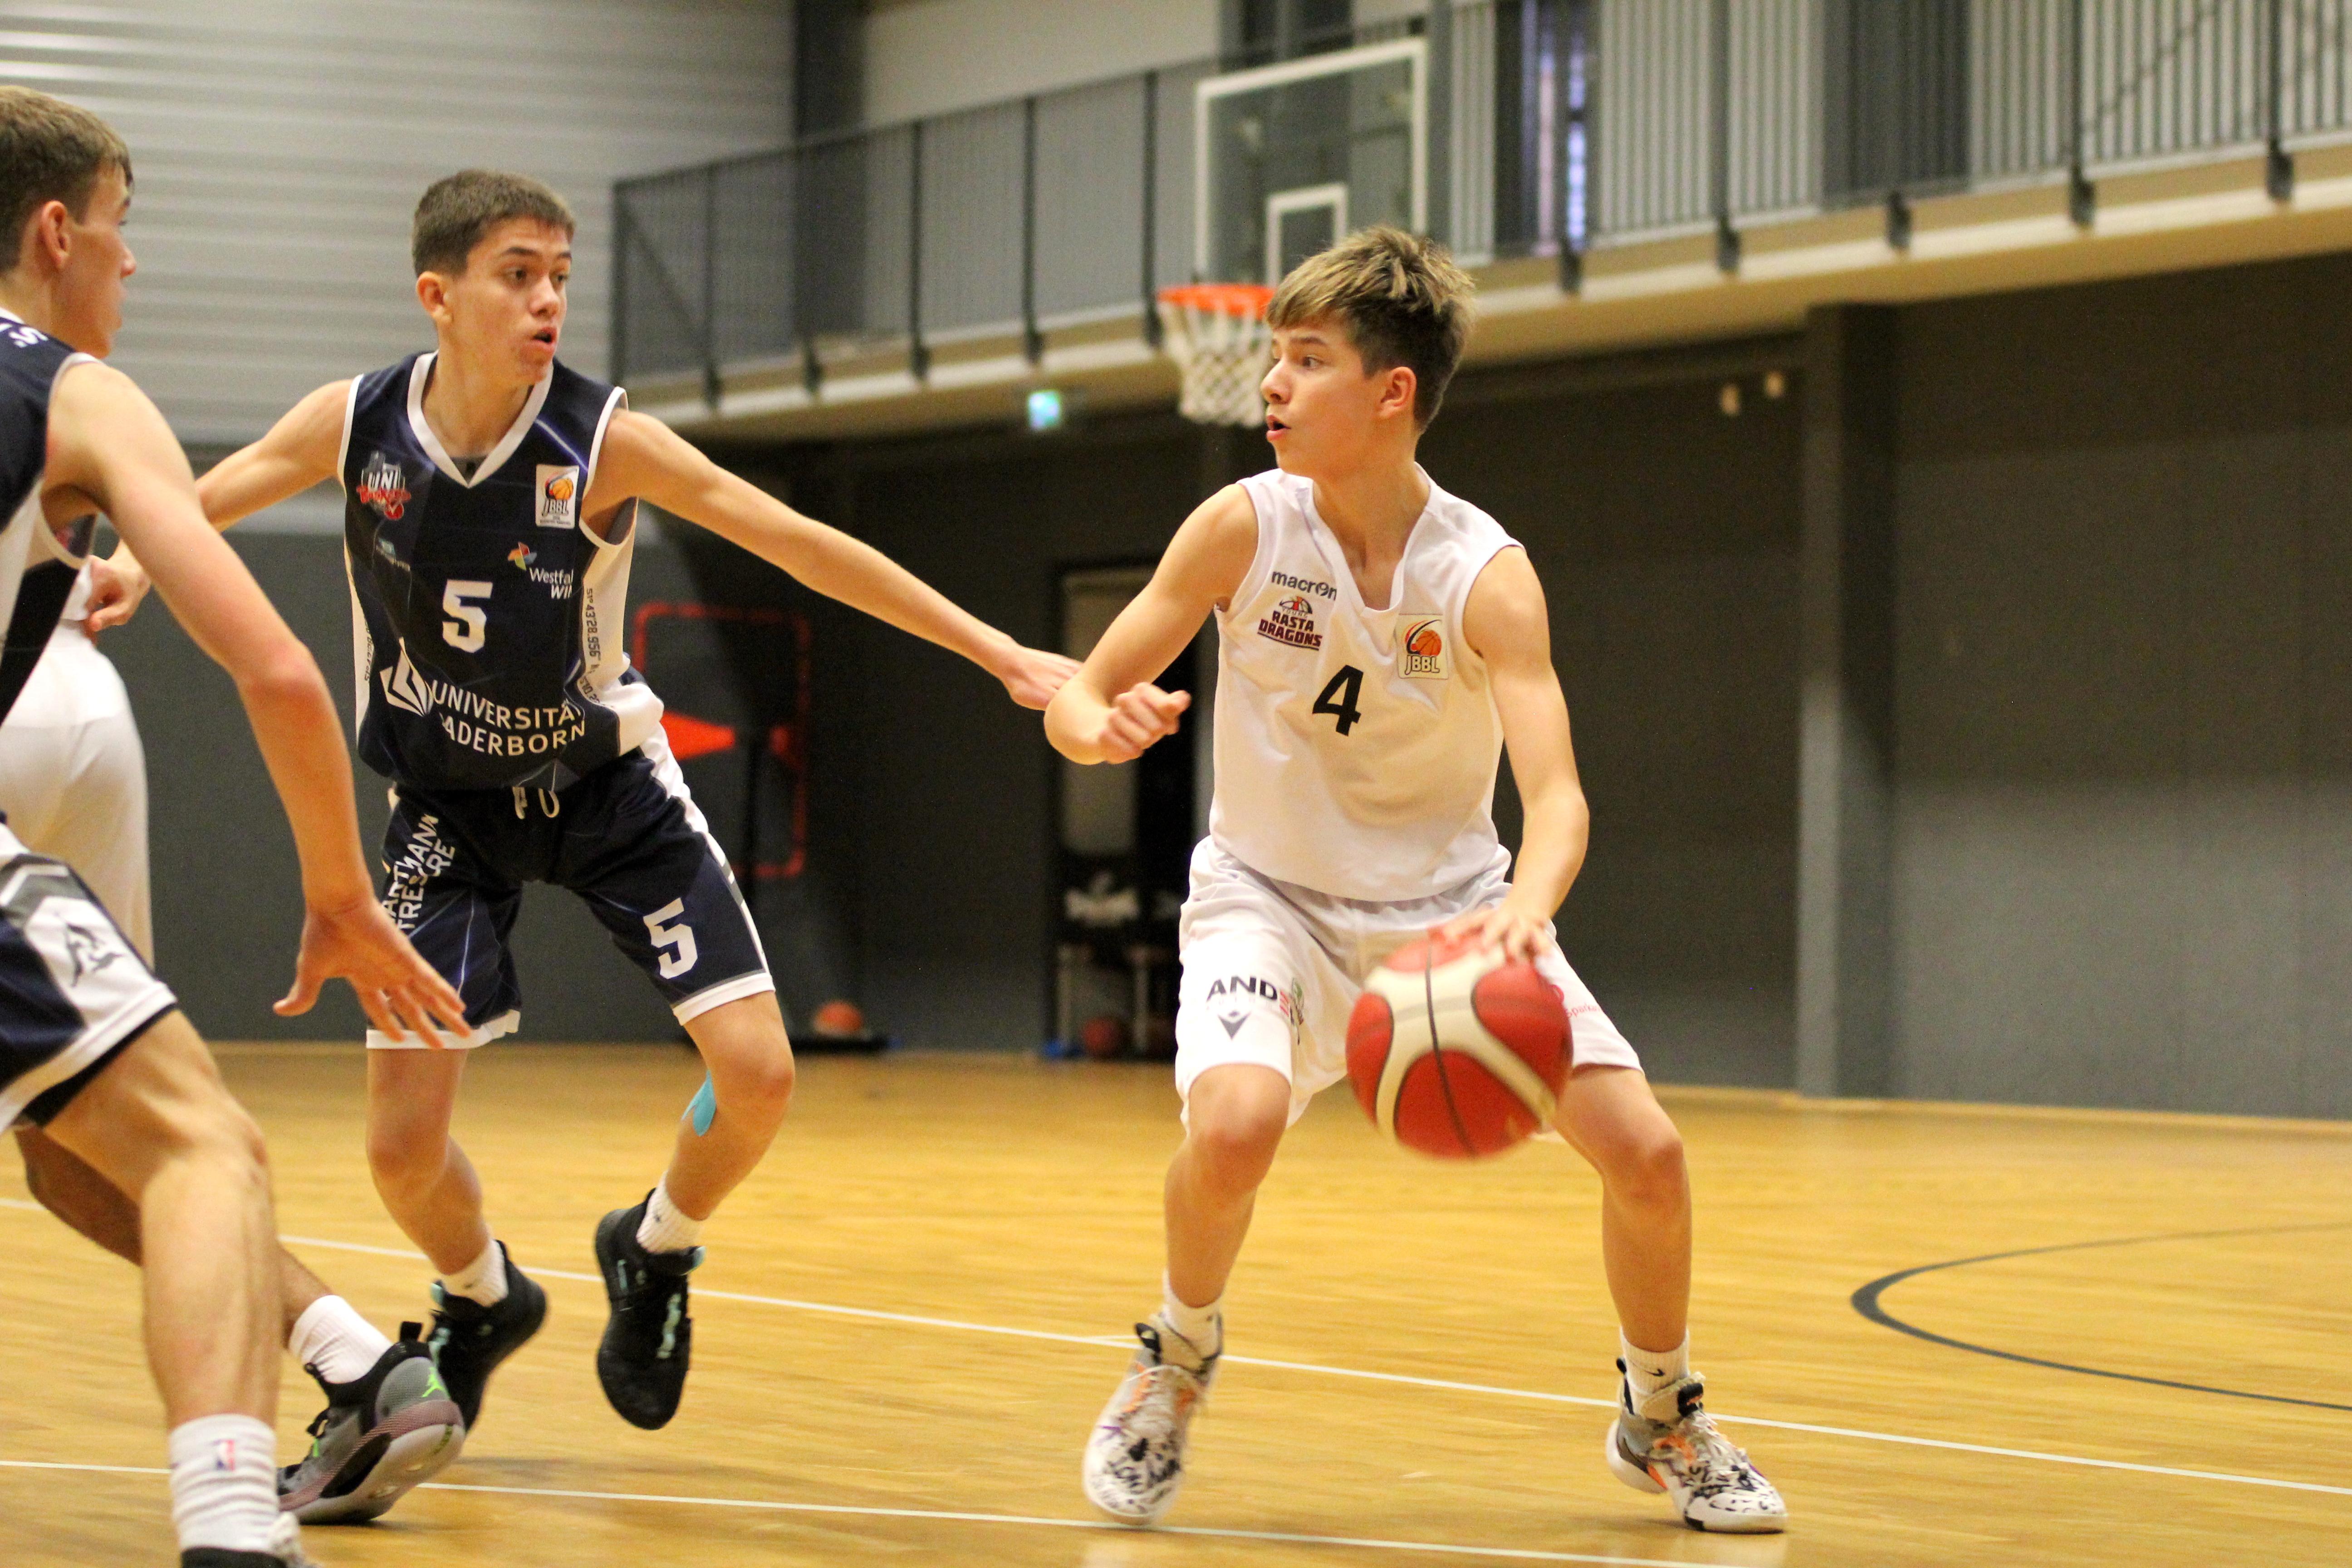 JBBL_20-21_YOUNG-RASTA-DRAGONS_Paderborn_Spieltag2_Jonas-Groß3